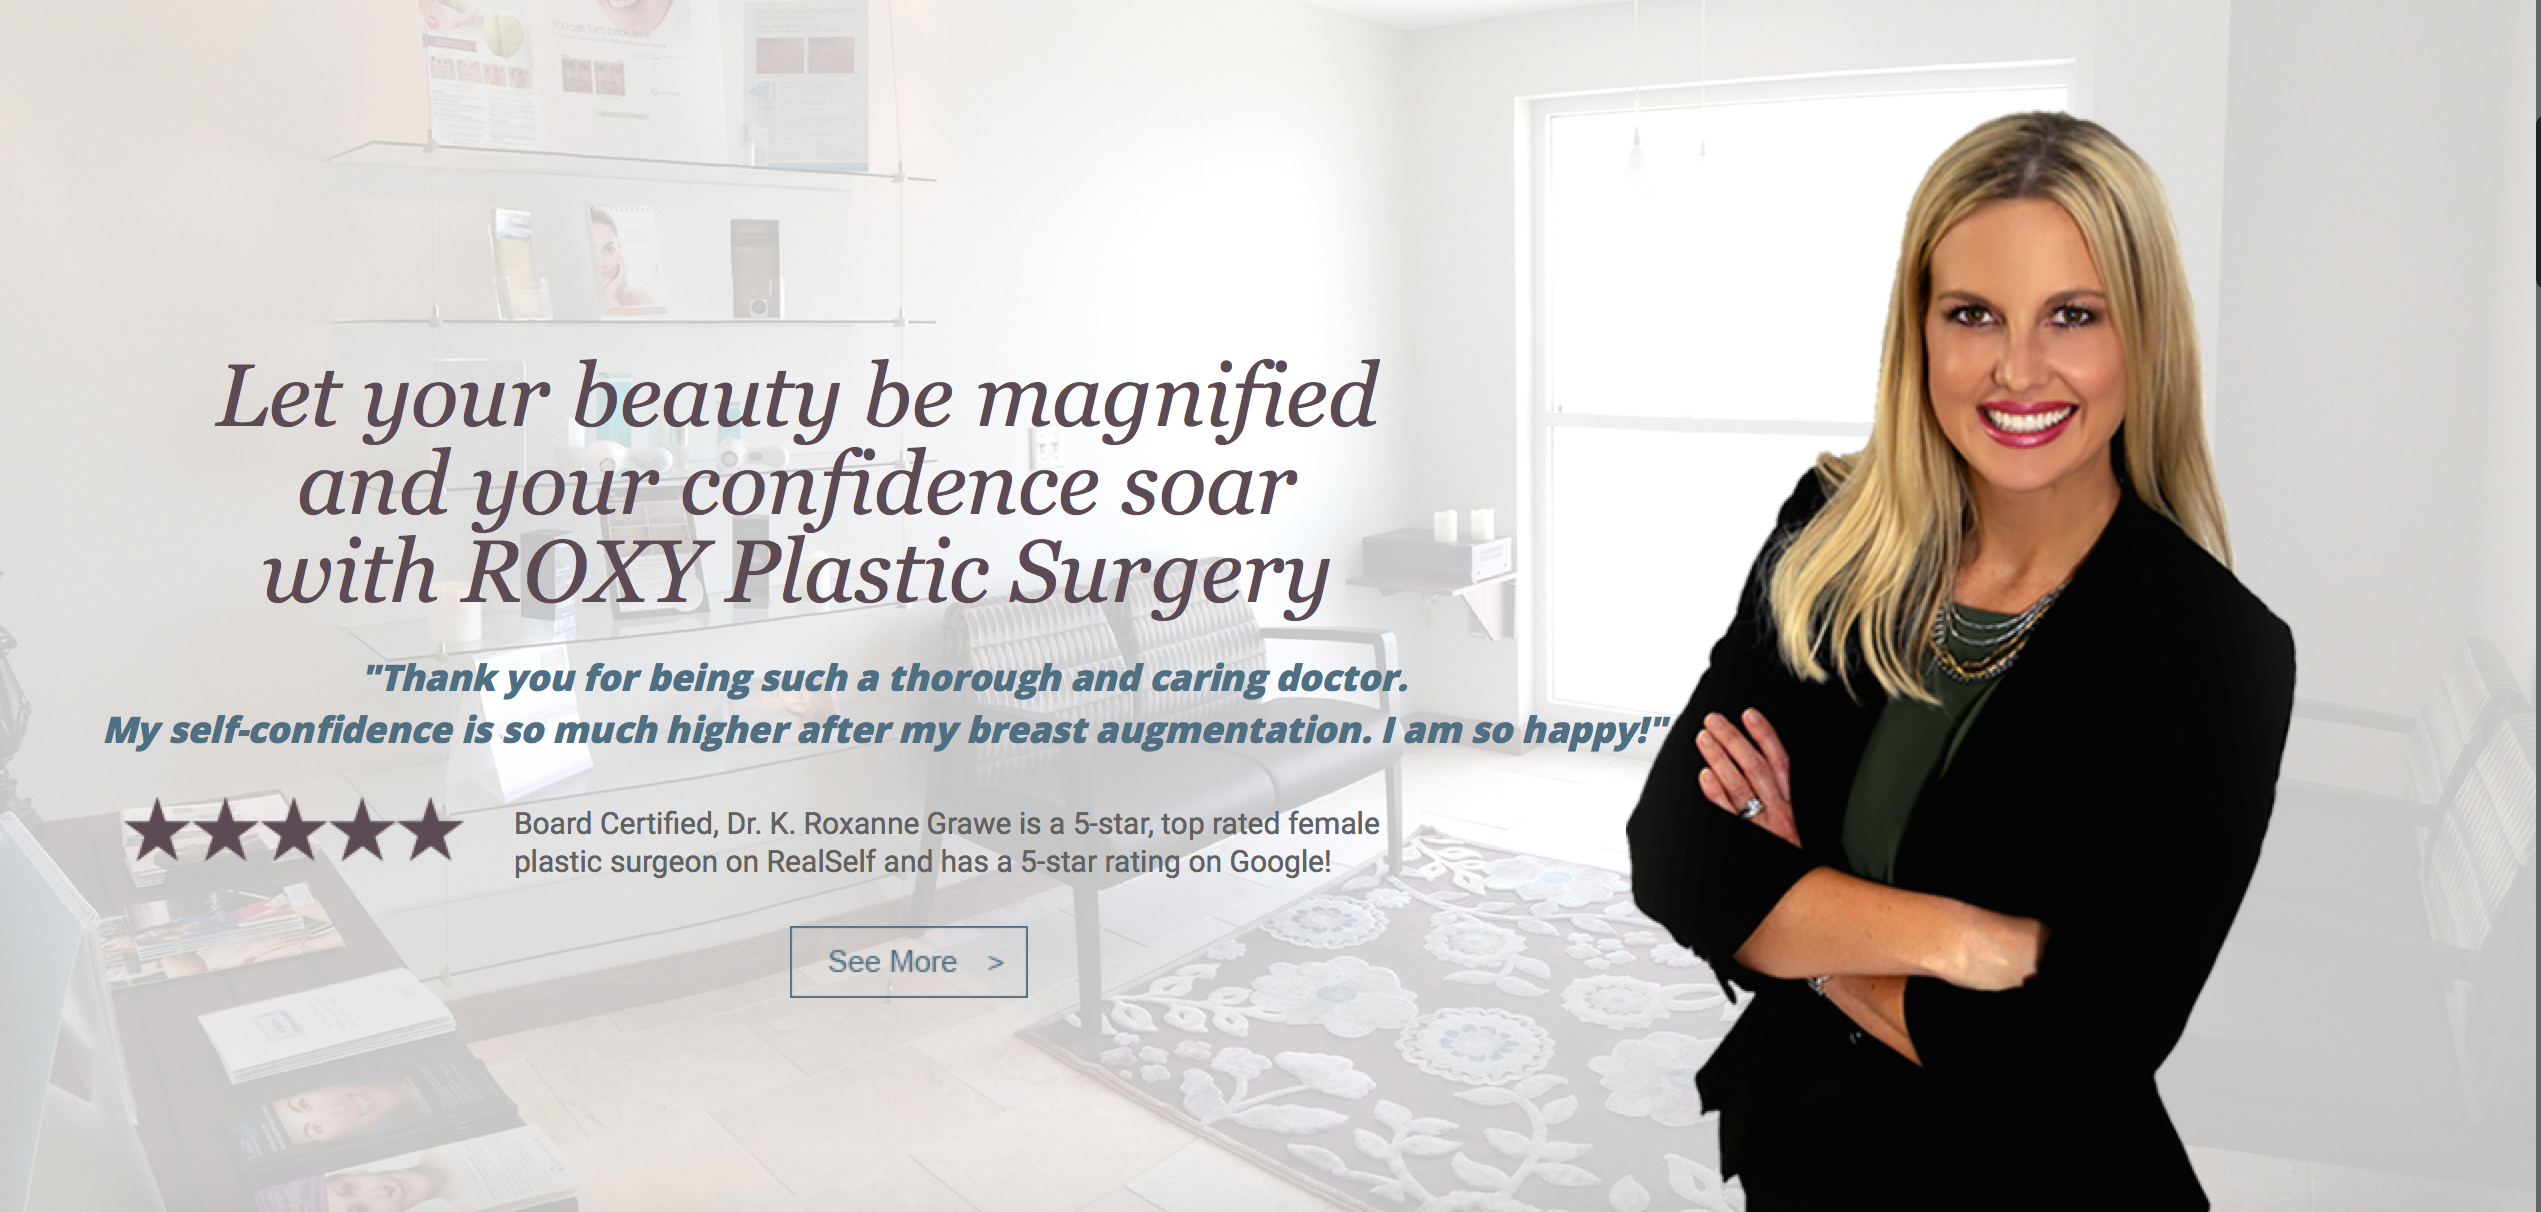 Dr. K. Roxanne Grawe - ROXY Plastic Surgery